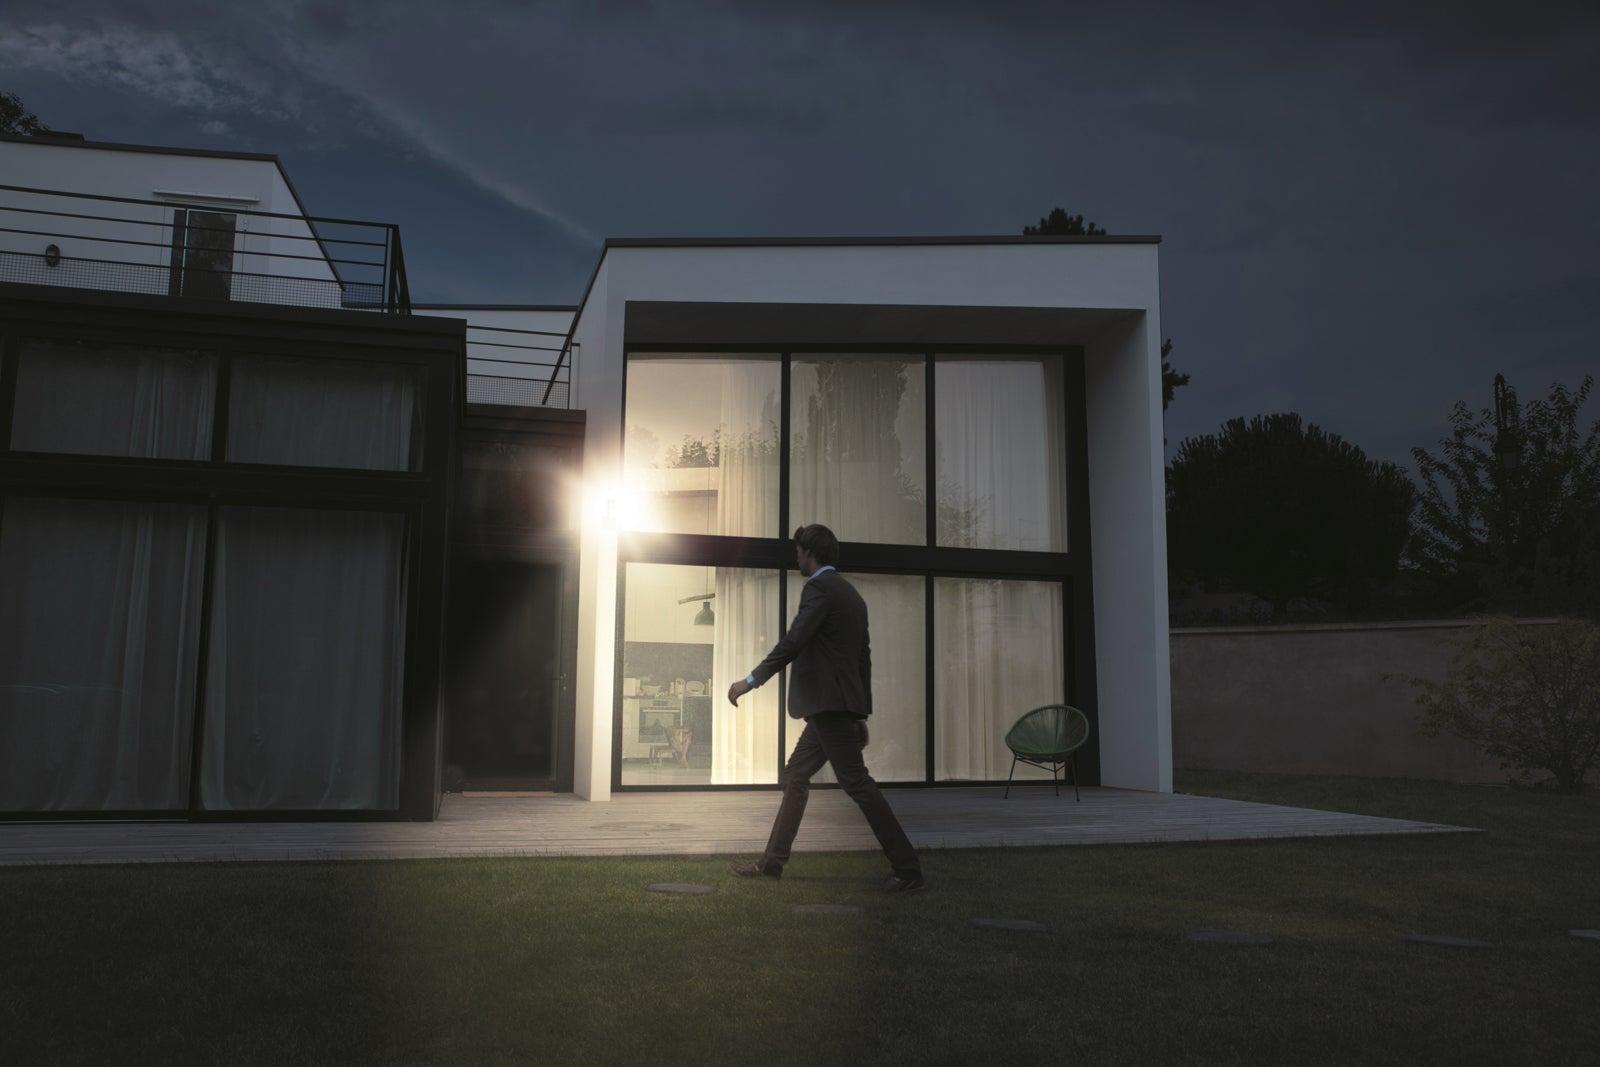 Porch Security Light